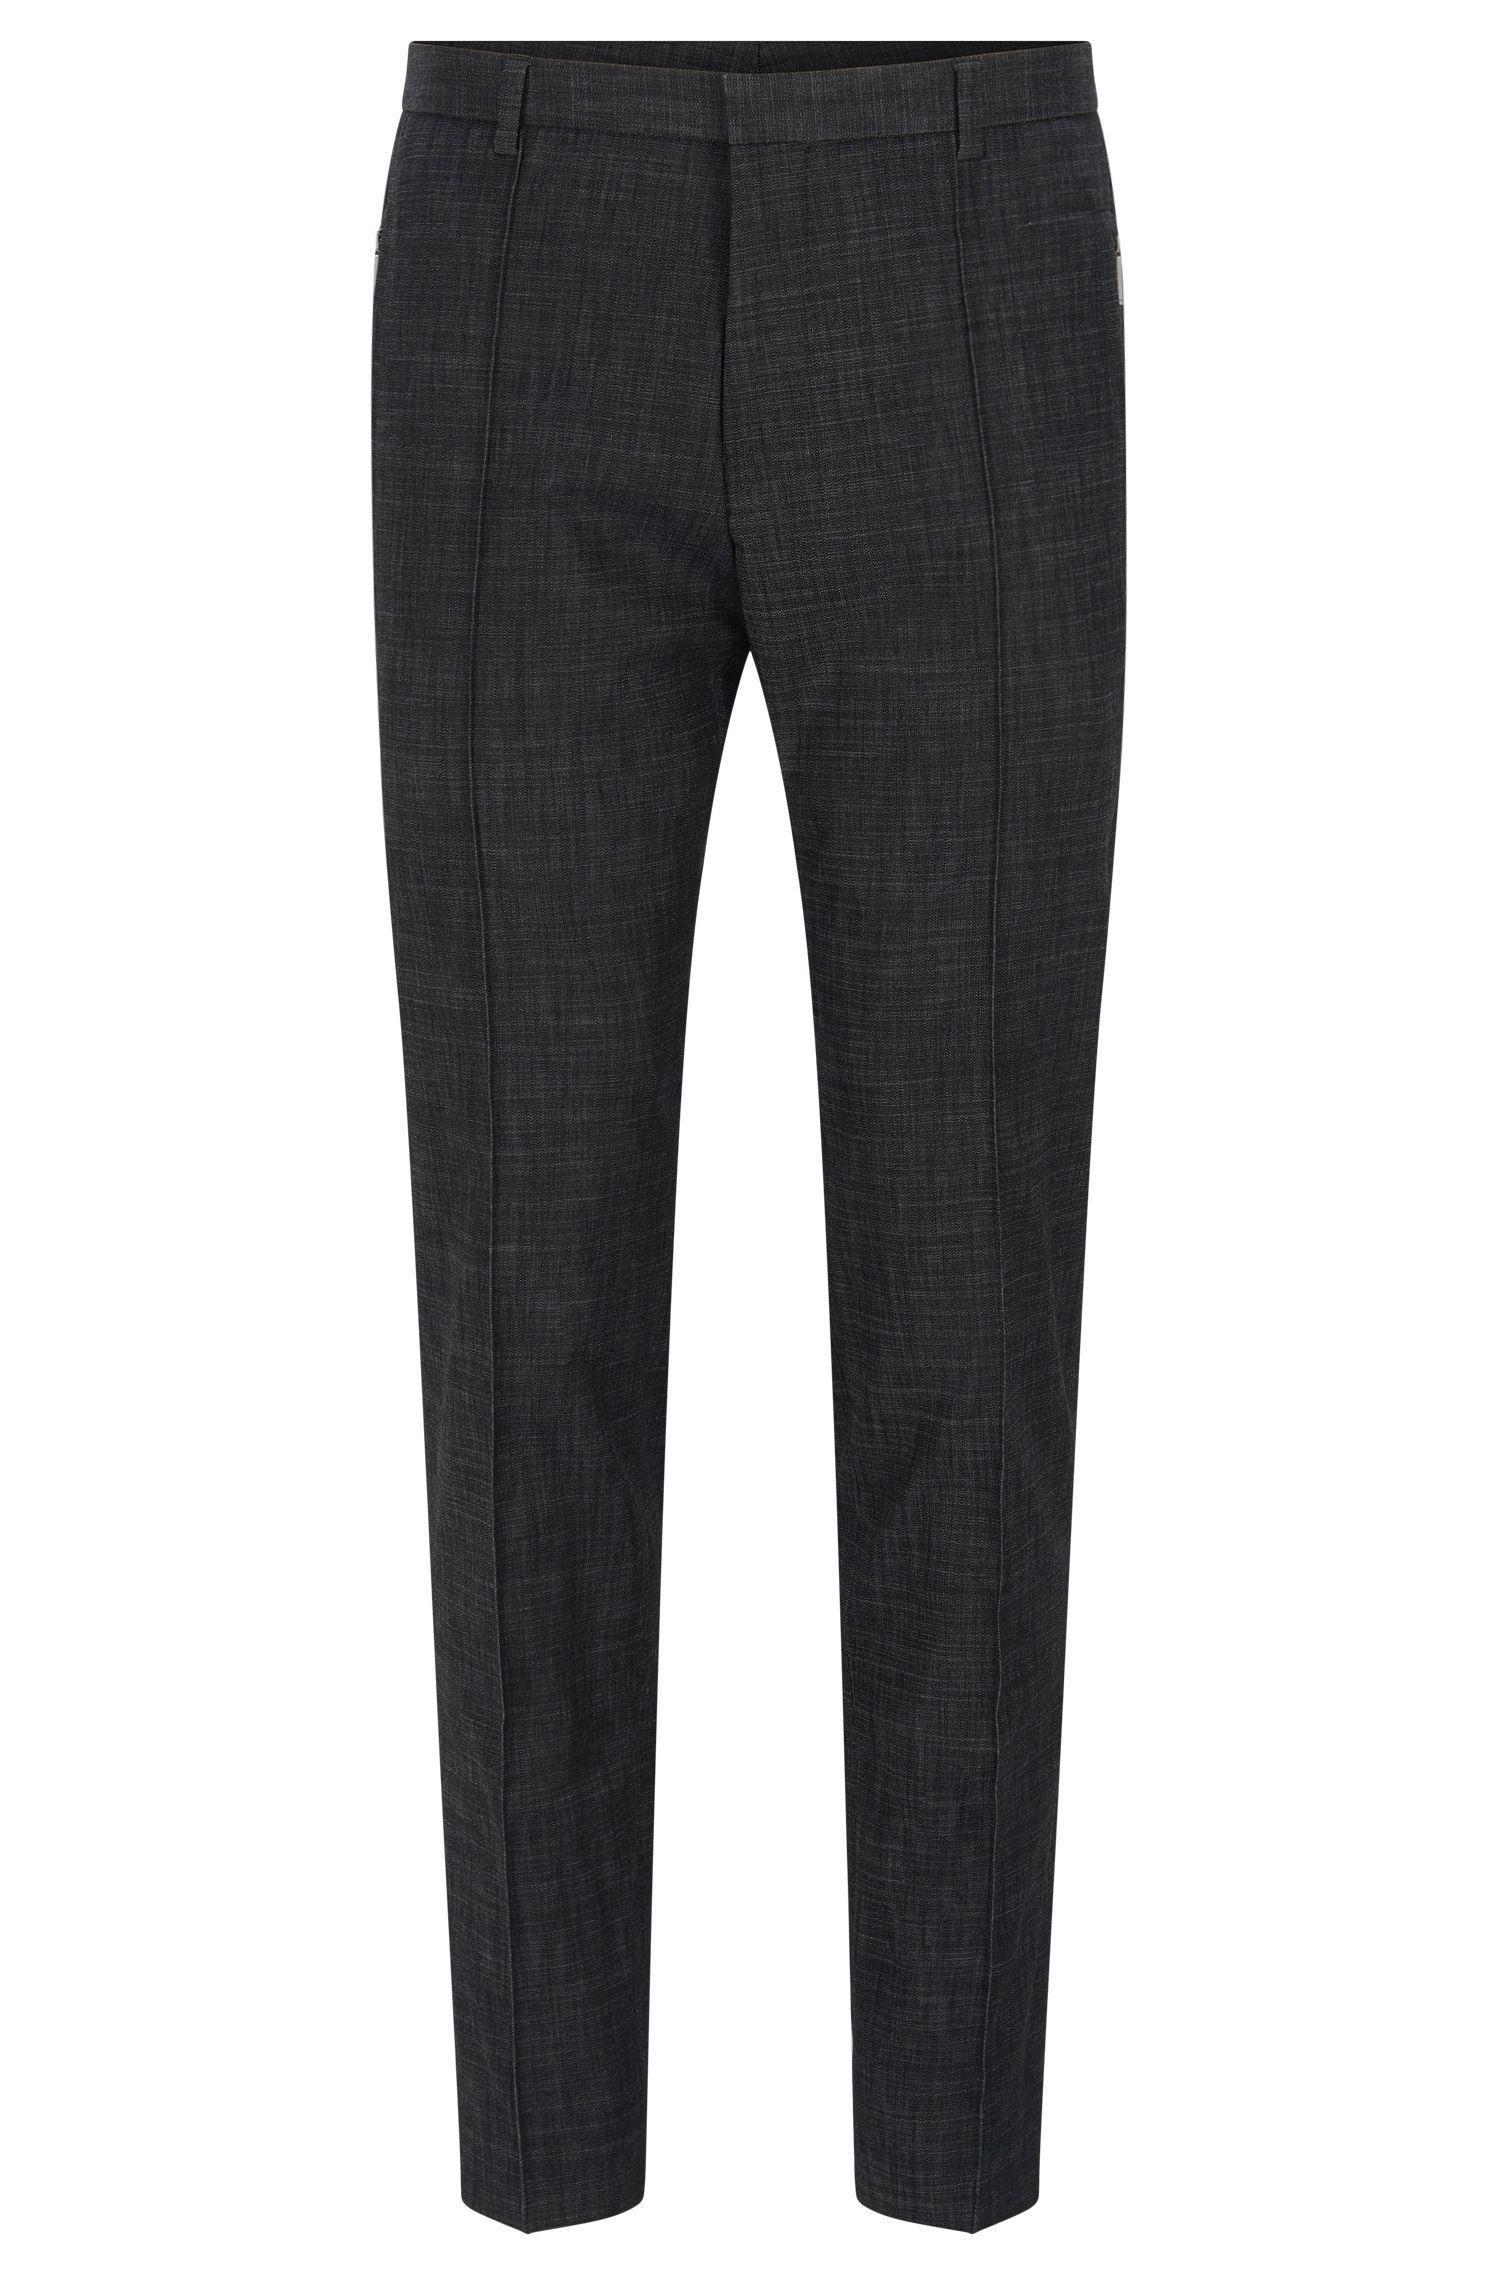 'Whitmore' | Extra Slim Fit, Cotton Blend Melange Dress Pants